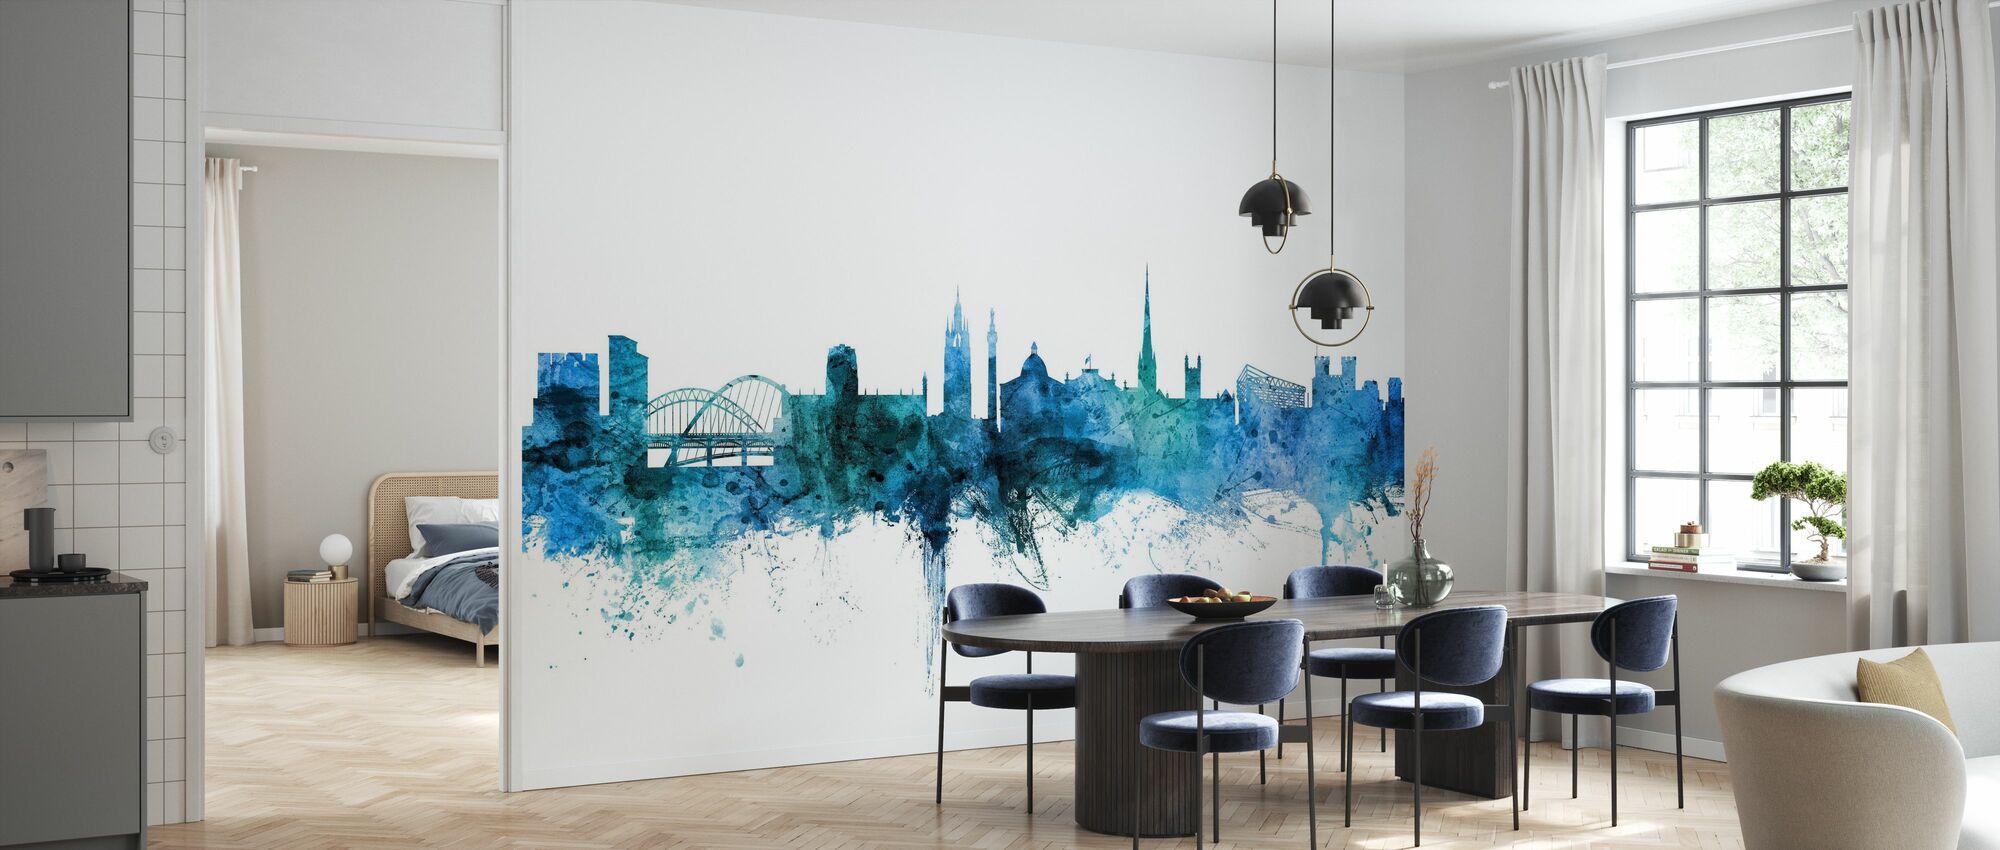 Newcastle England Skyline - Wallpaper - Kitchen